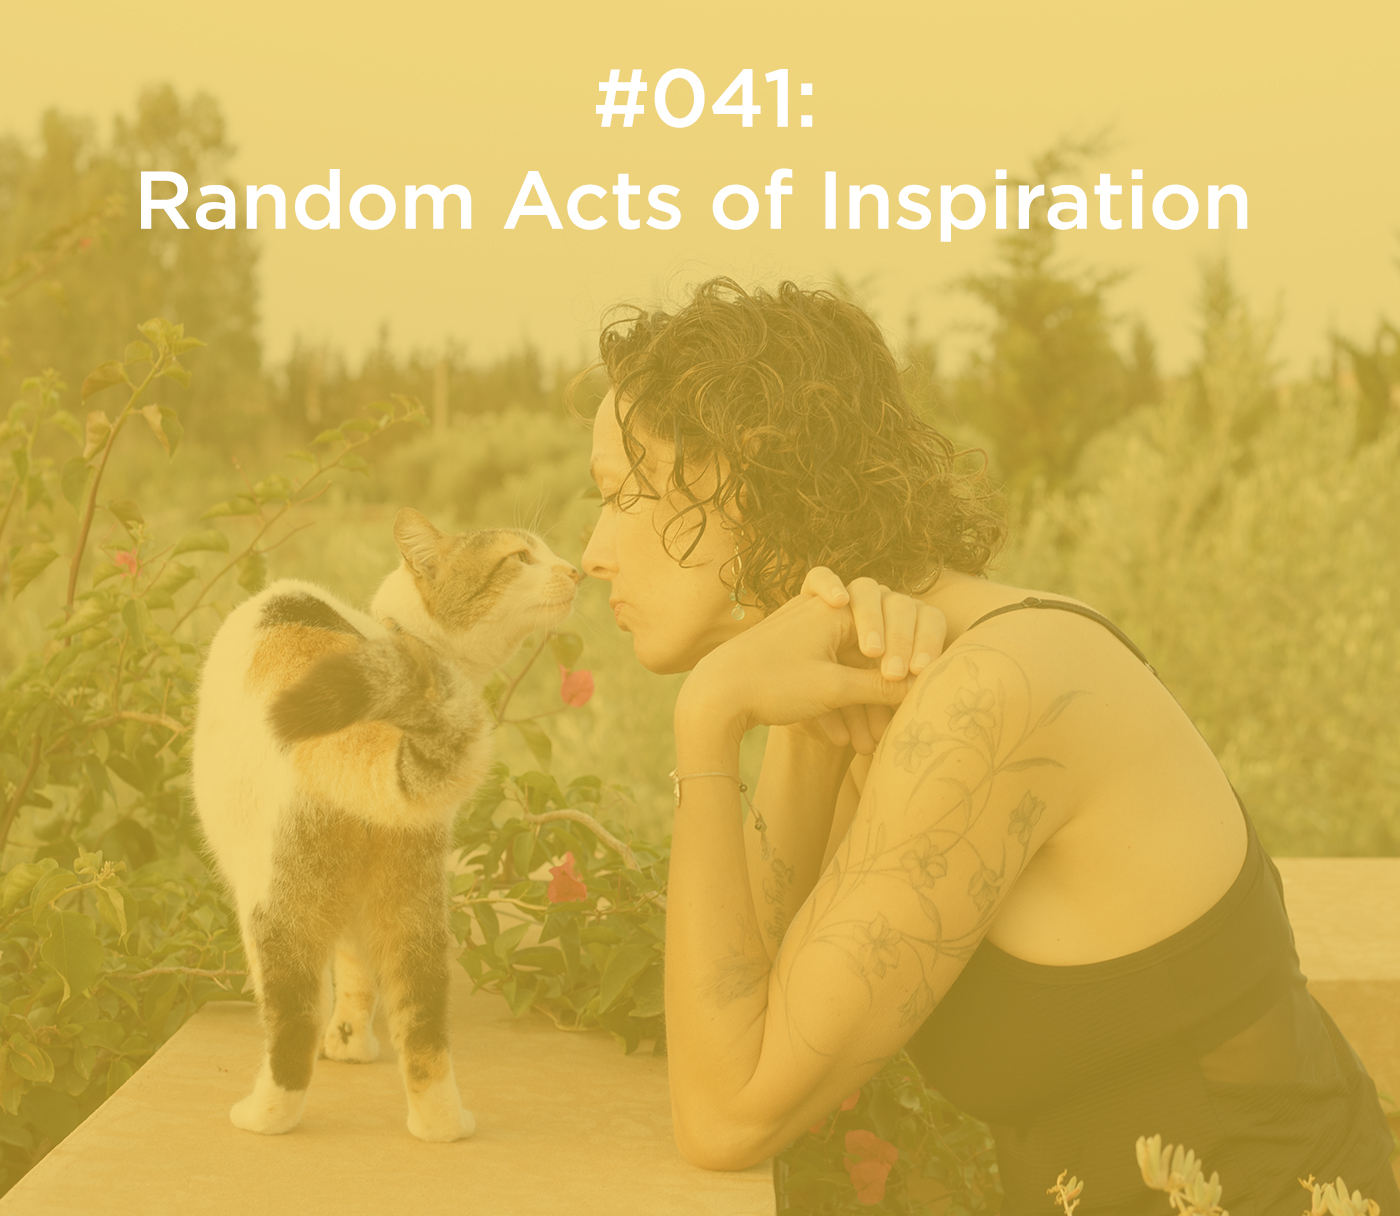 Random Acts of Inspiration